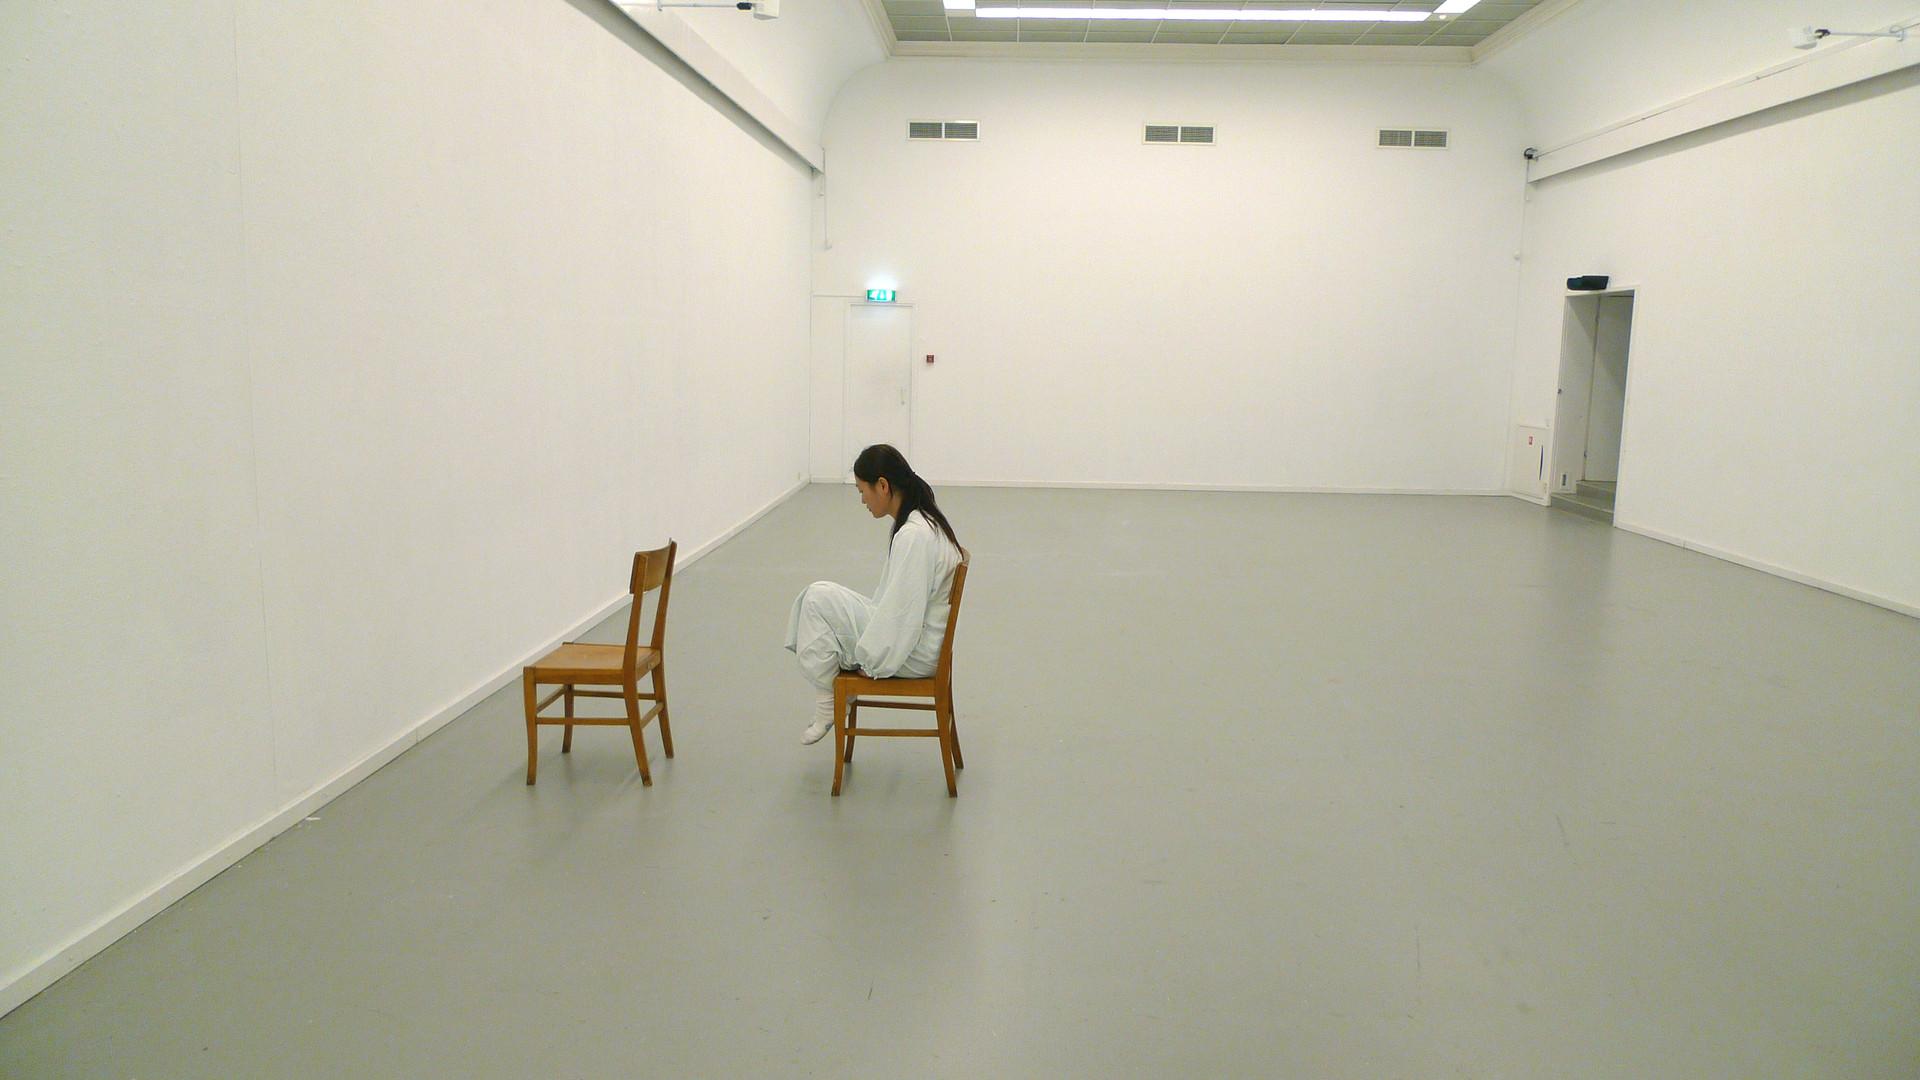 Mayumi Nakazaki – Danuvia 003025